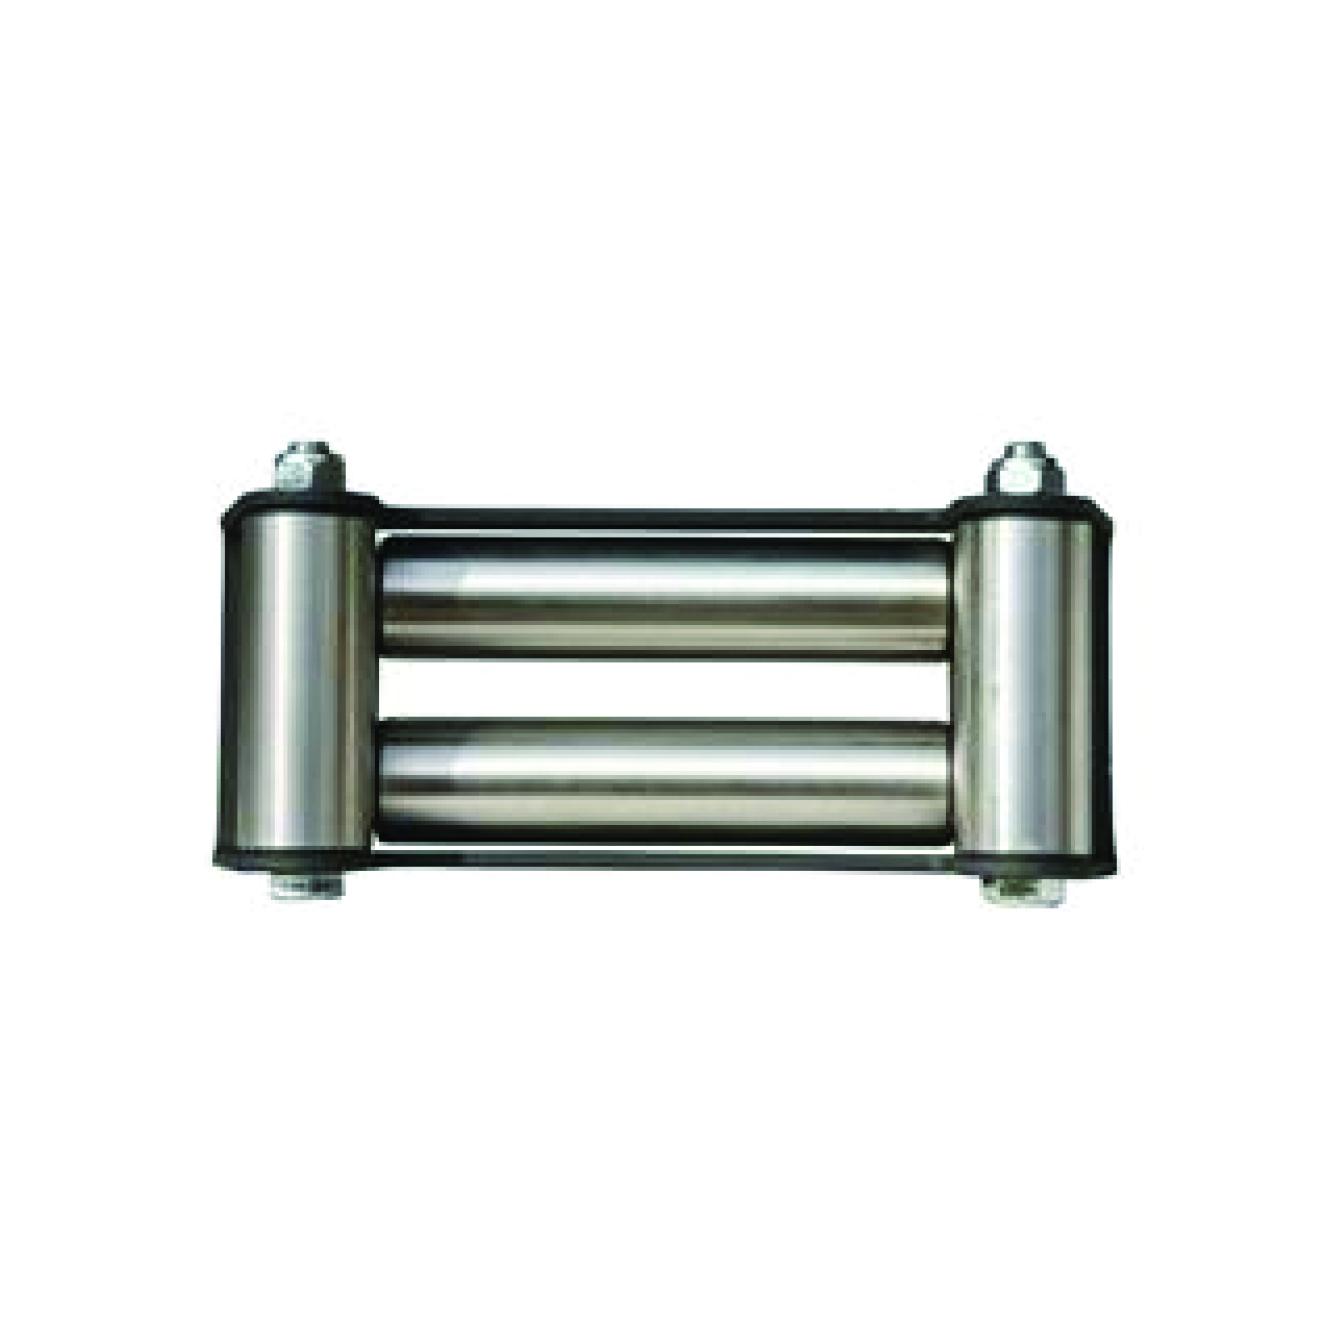 Superwinch Roller Fairlead 90-32493